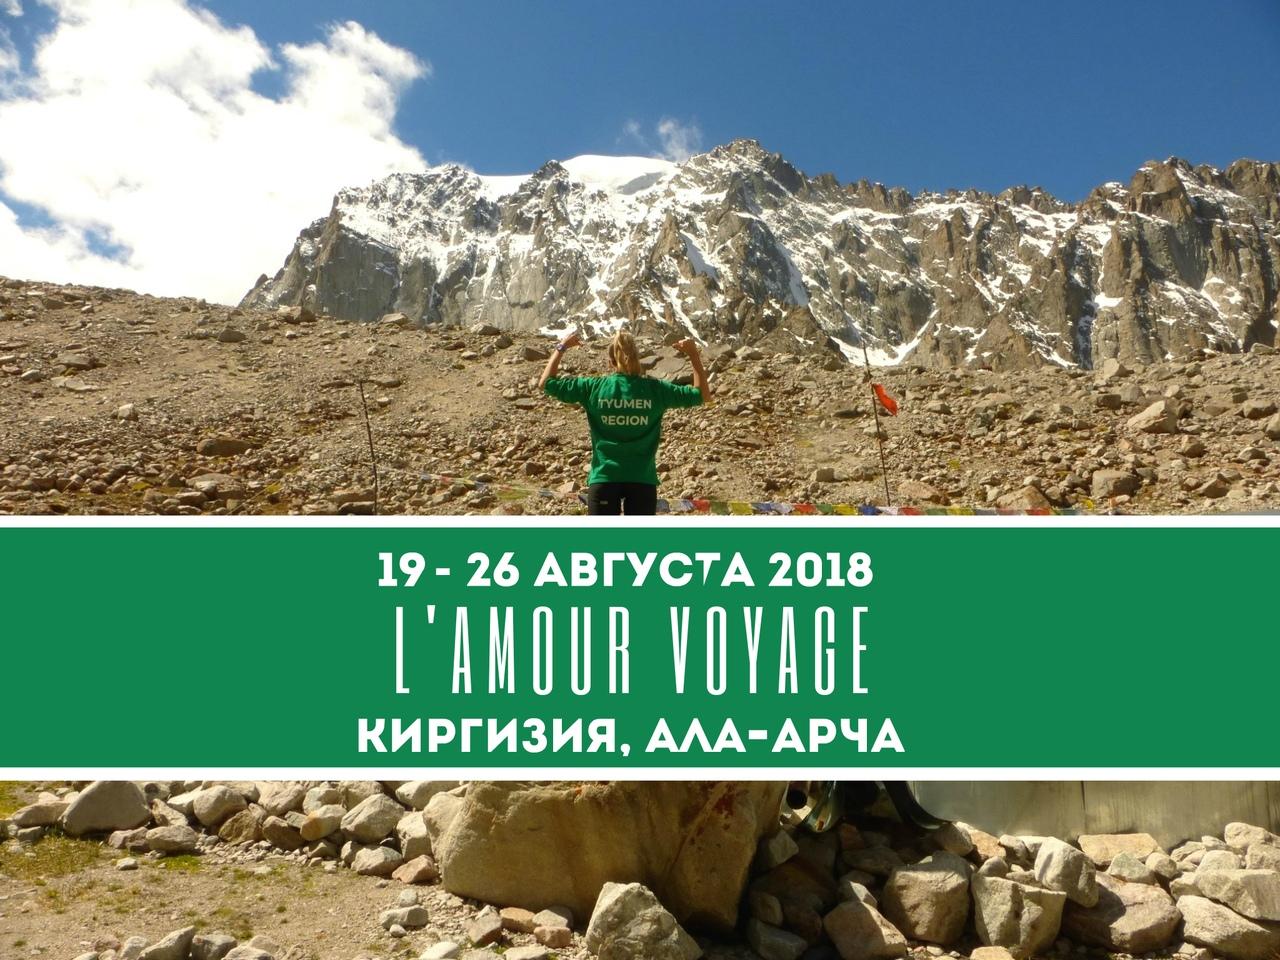 Афиша Киргизия / 19 - 26 августа / Ала-арча